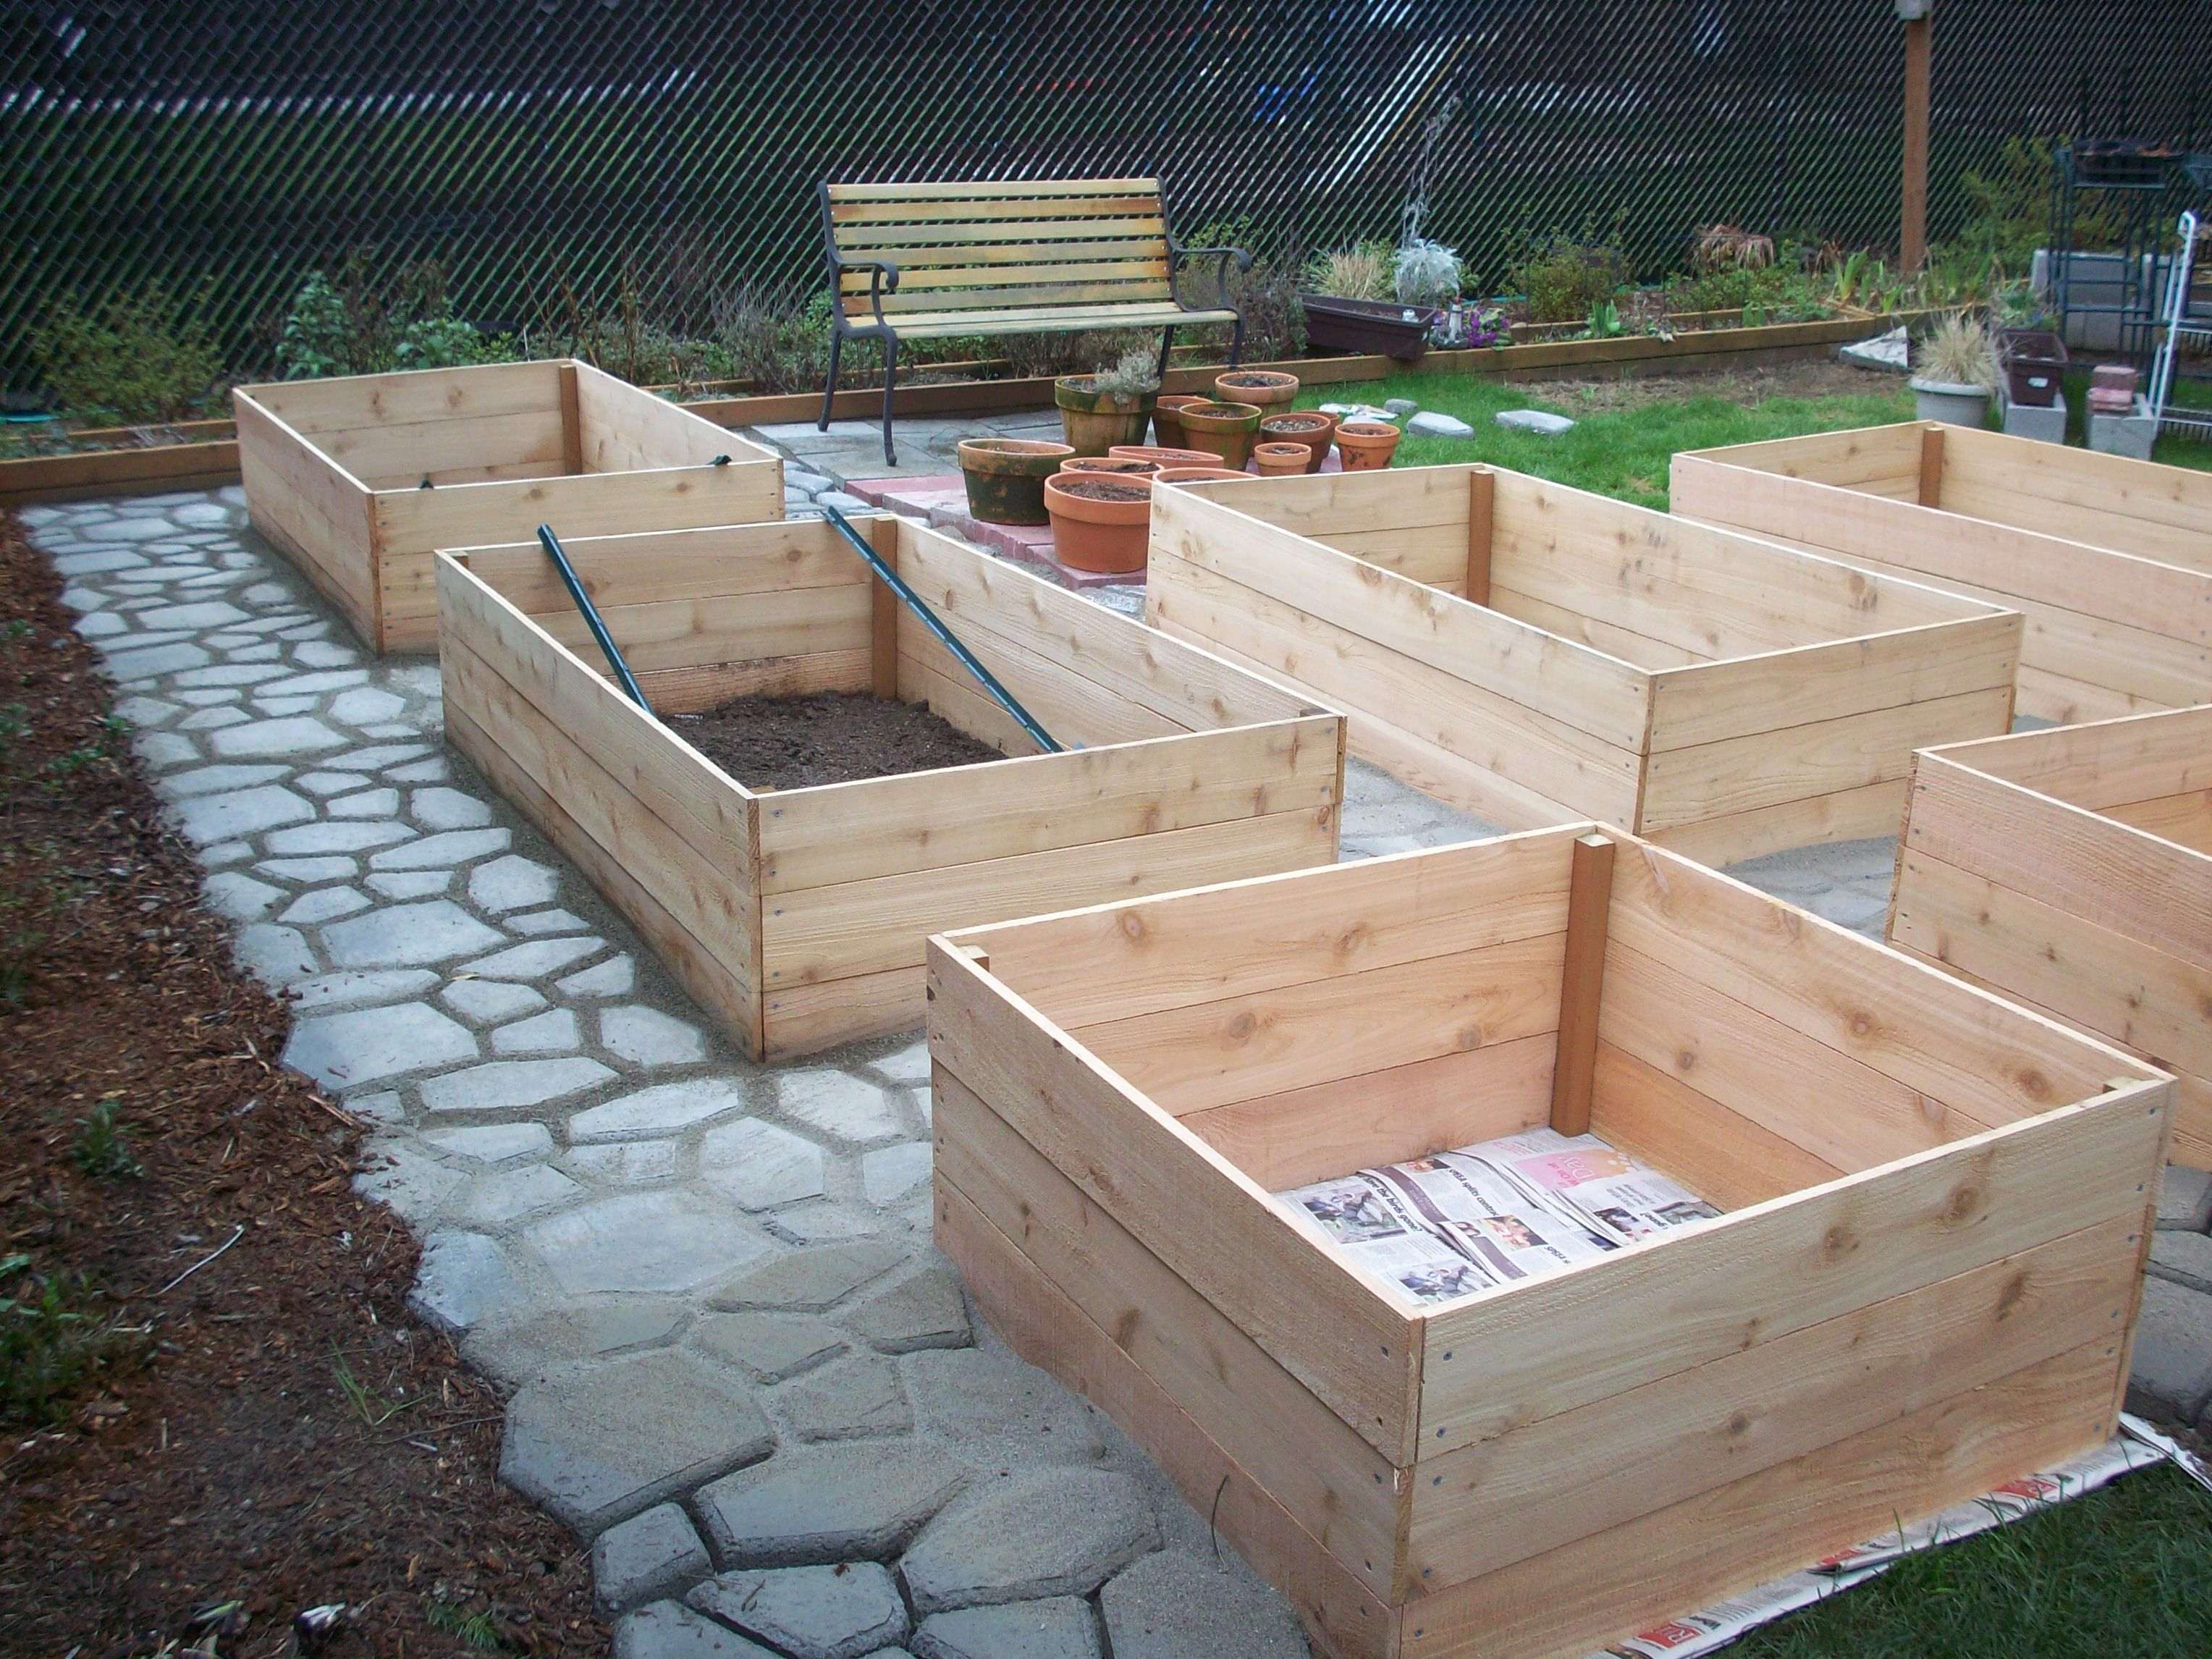 Walk In Garden Box: Planter Boxes With Cobble Stone Walk Way